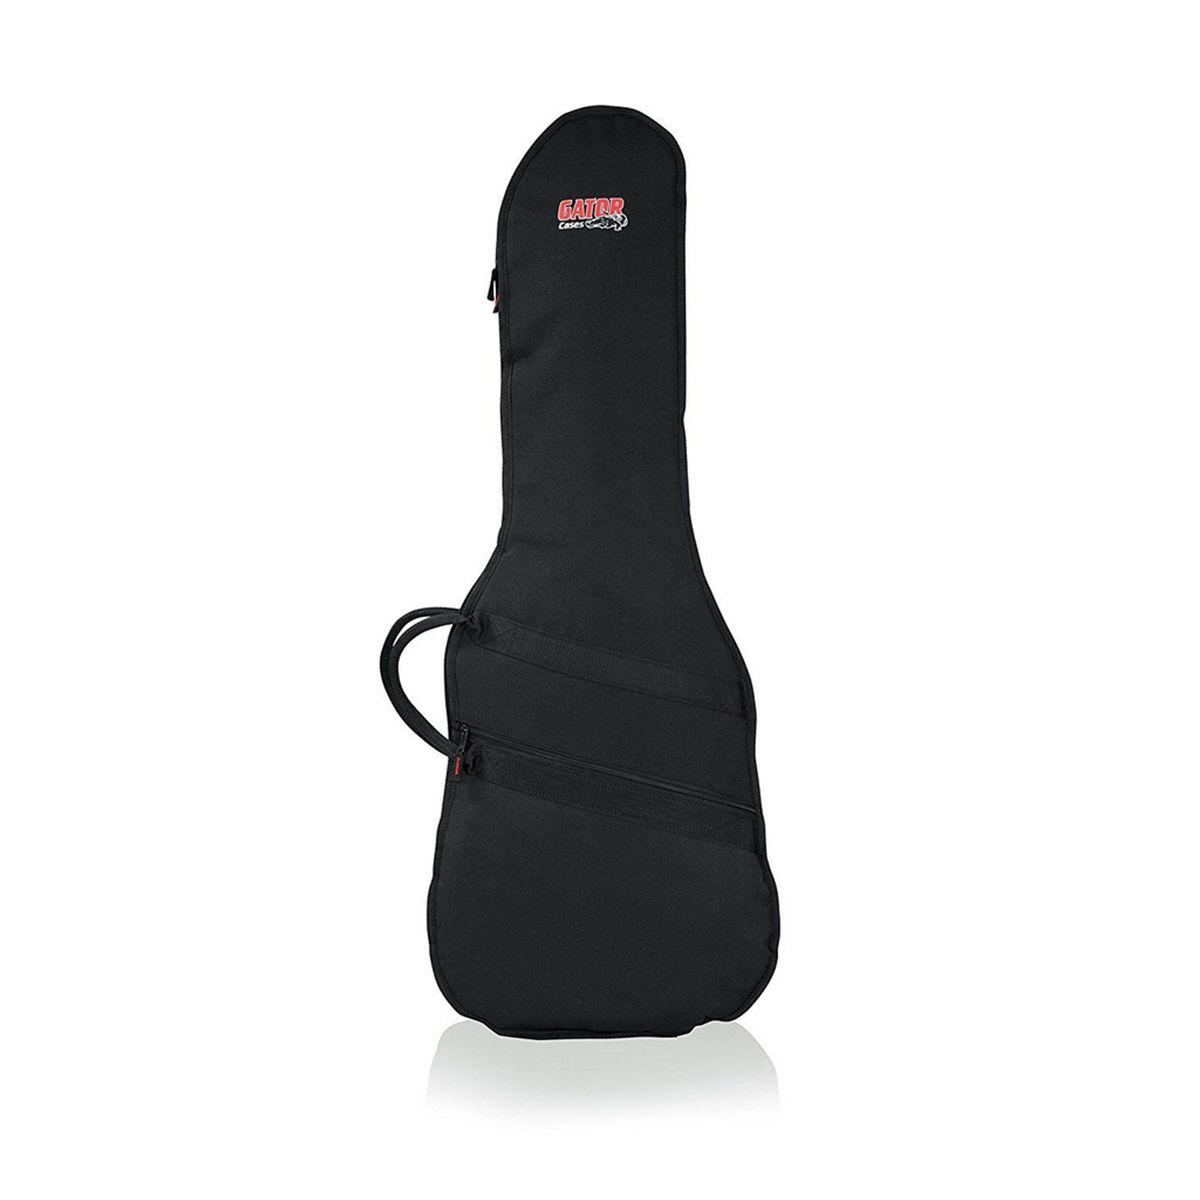 Capa Gator GBE Elect para Guitarra